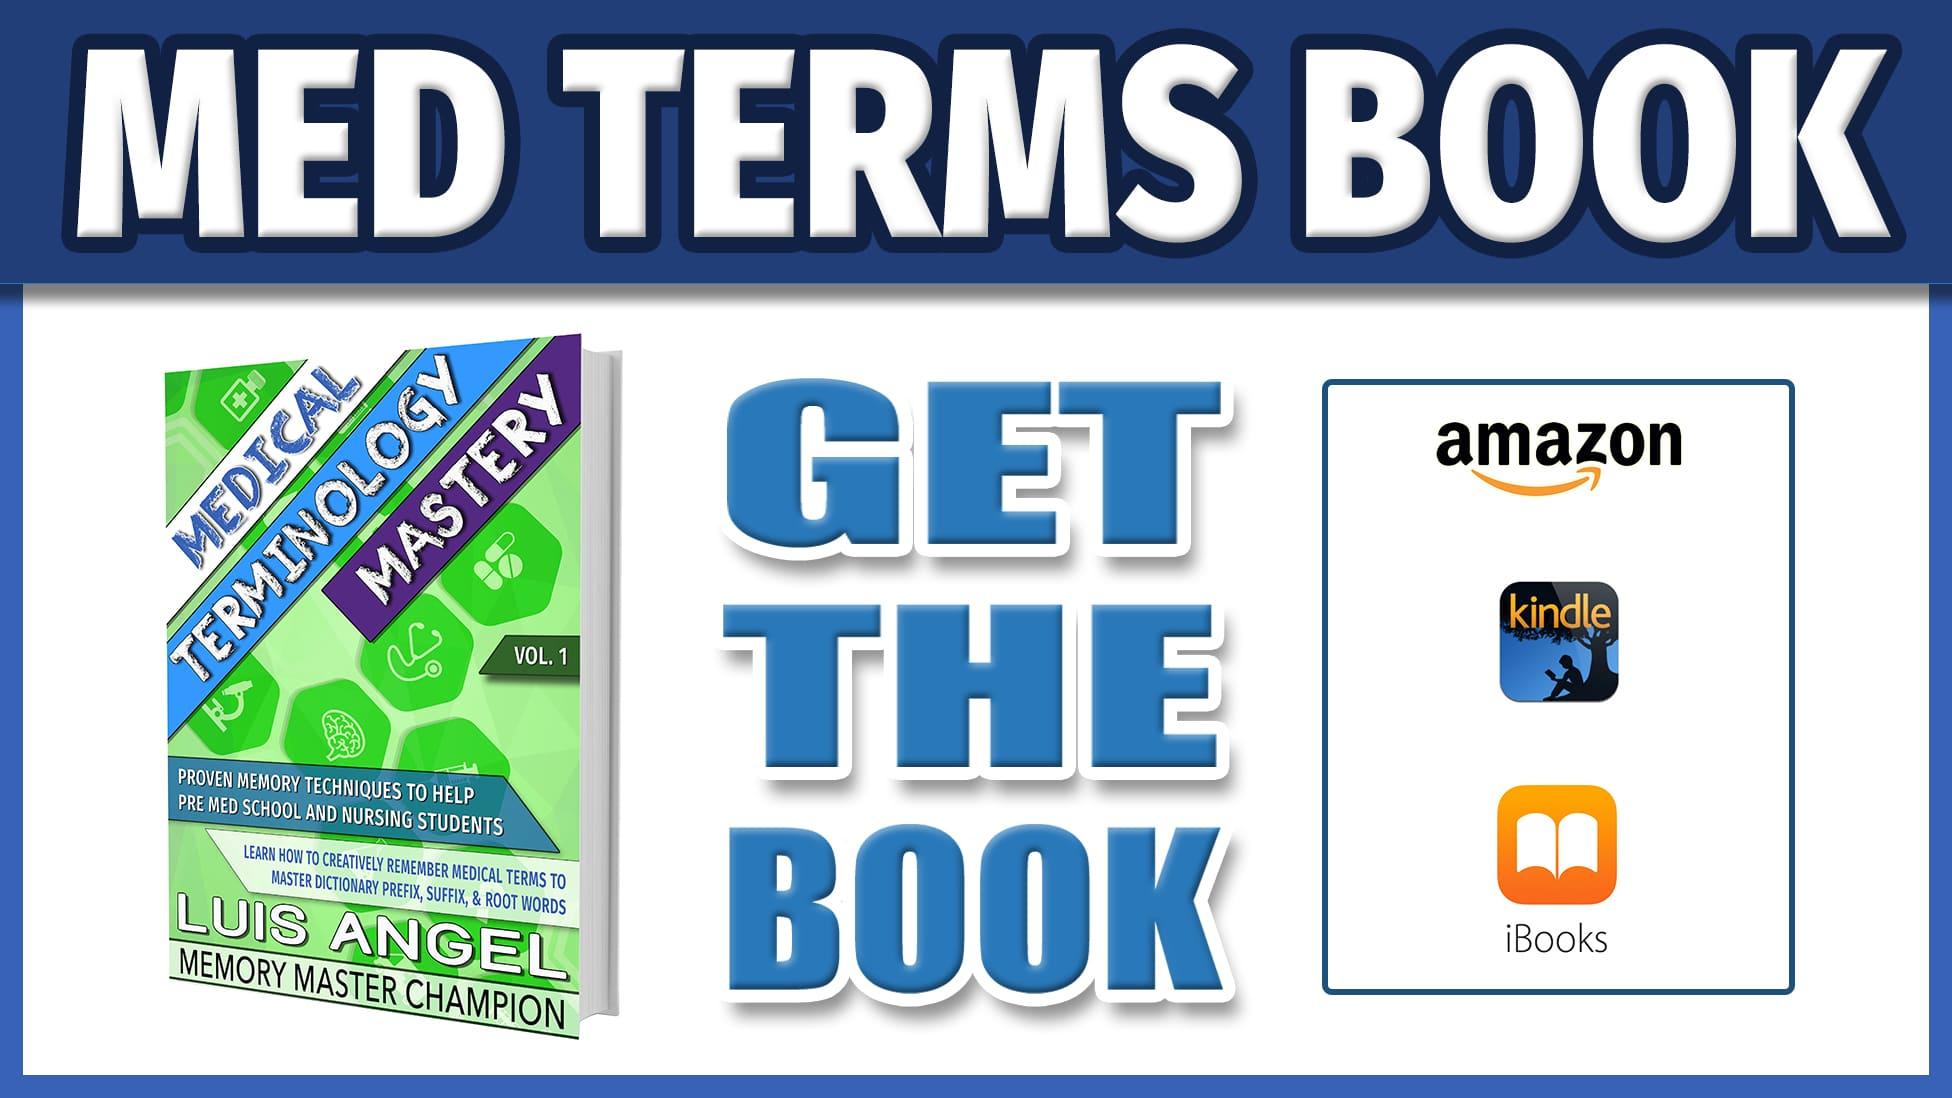 Medical Terminology Course Book Slide